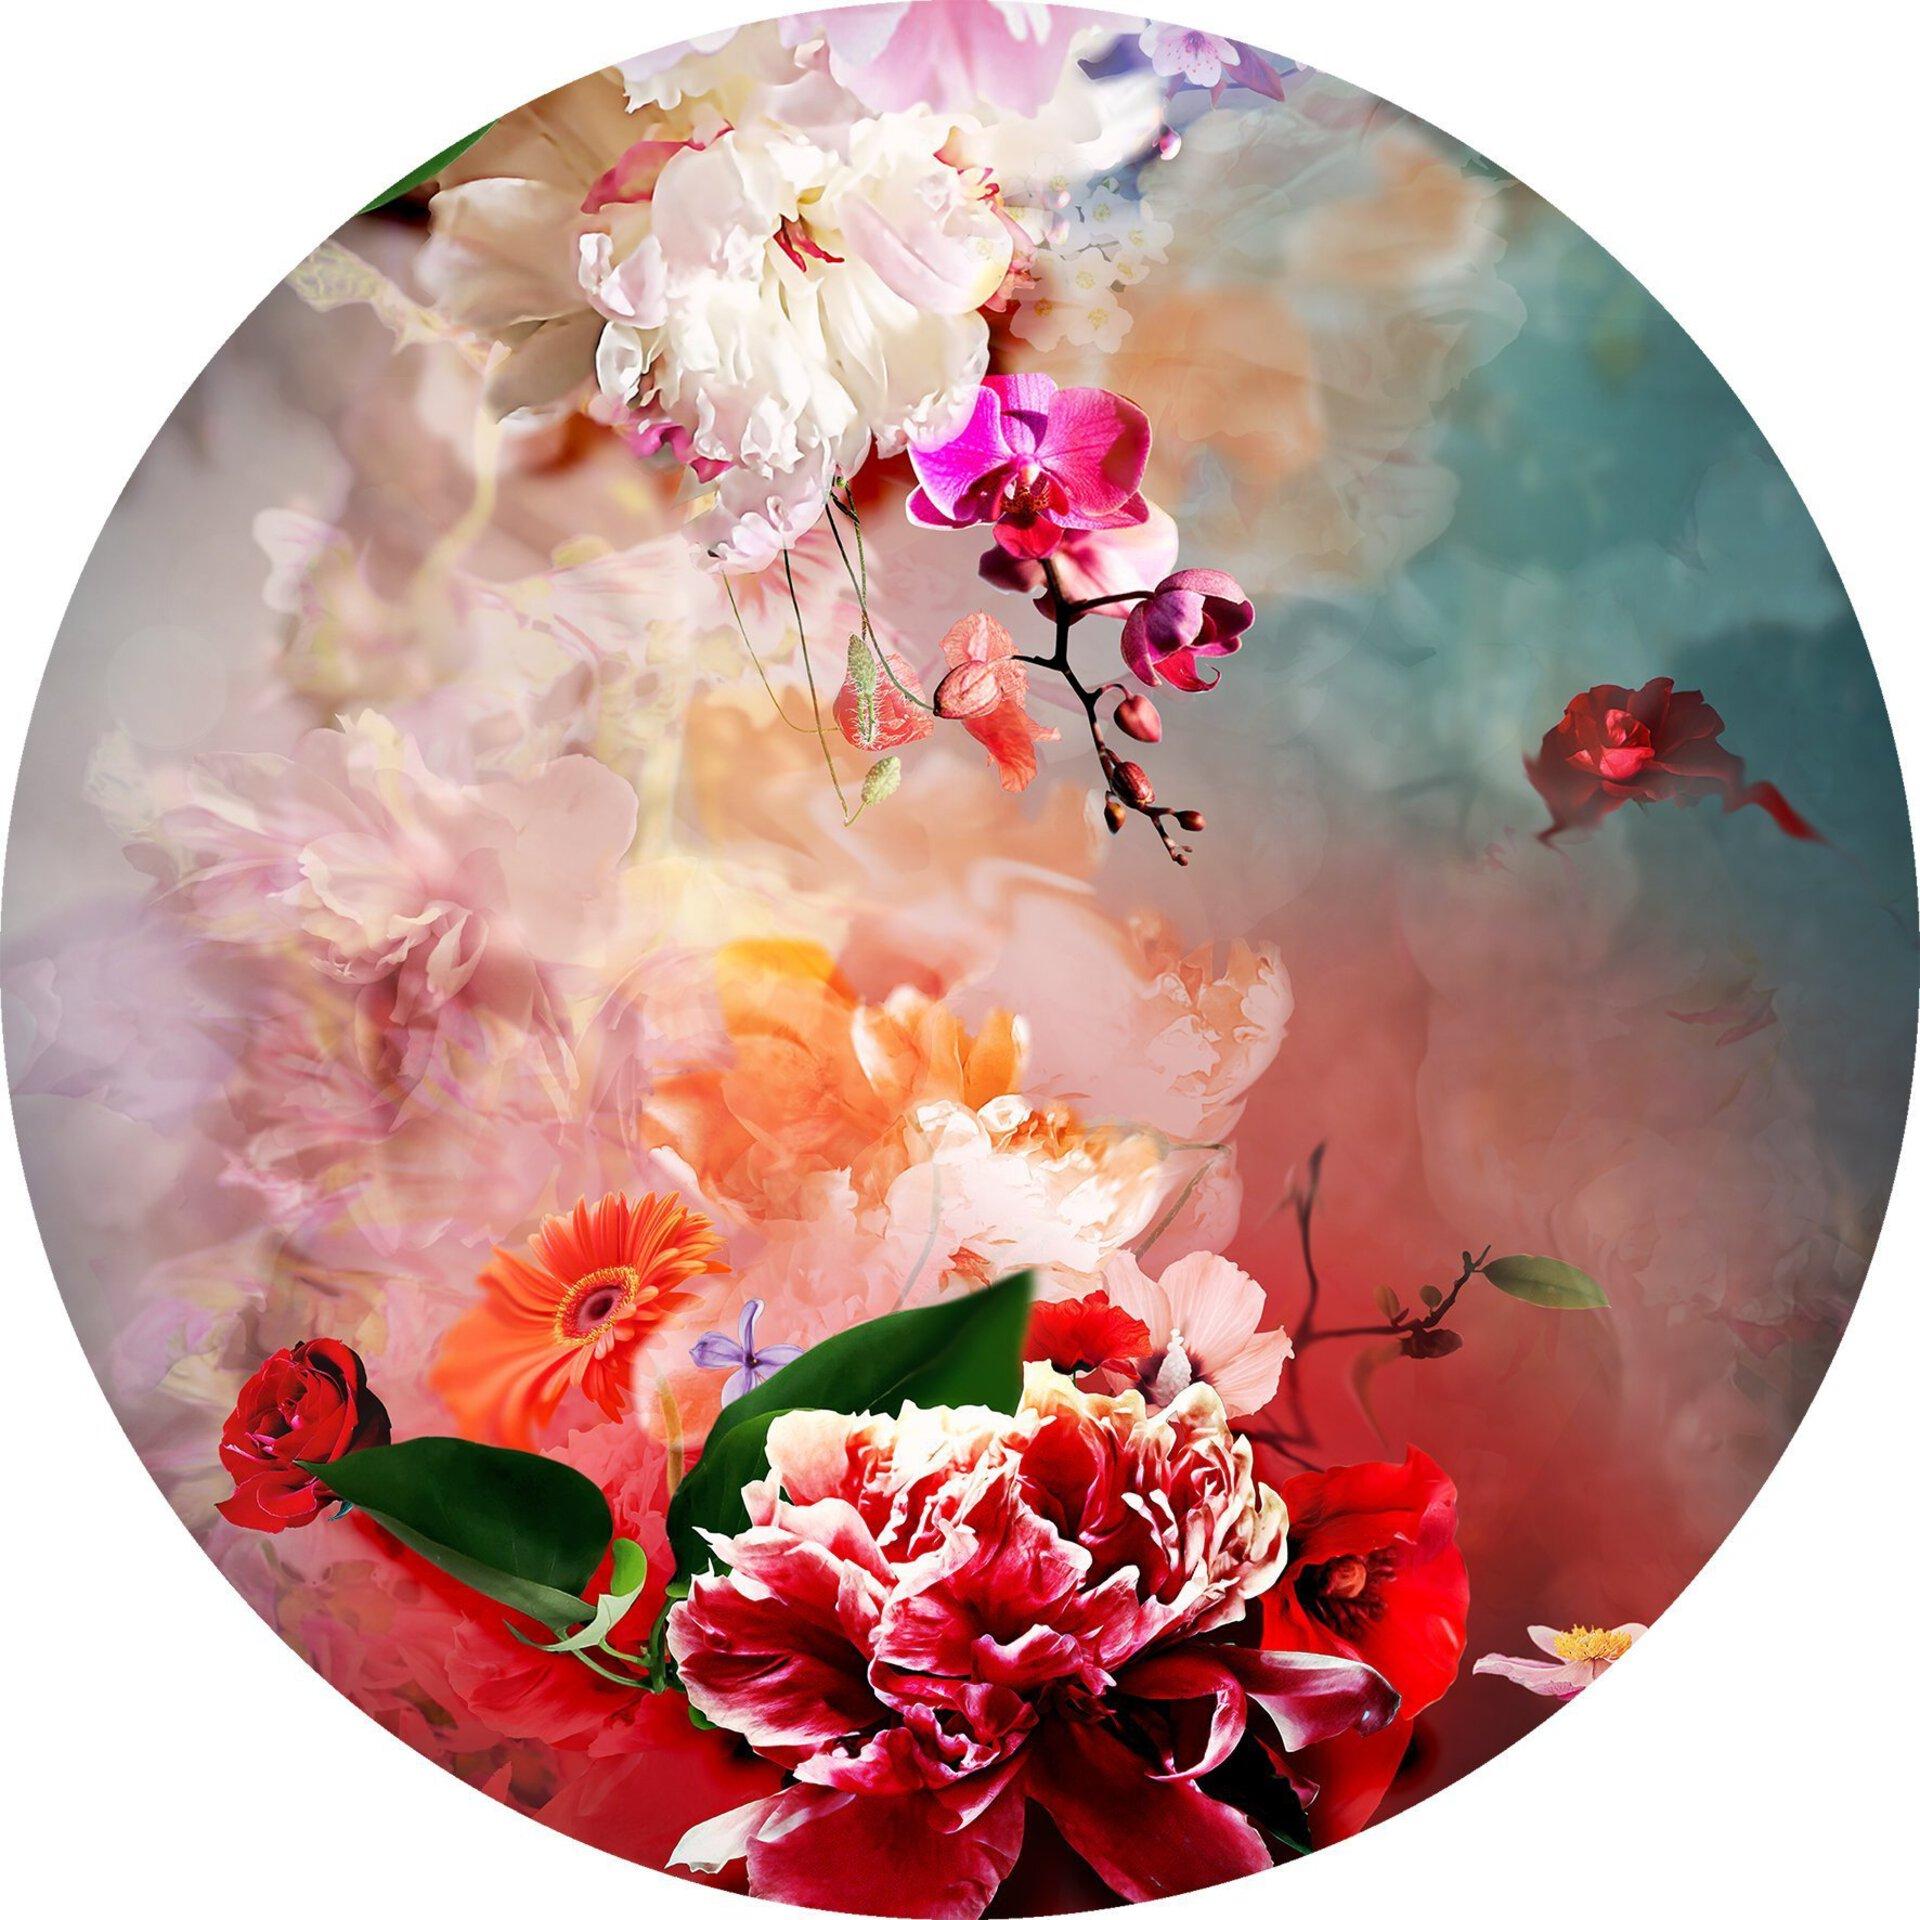 Bild Colourful Baroque Flowermix III Pro-Art Glas mehrfarbig 30 x 30 x 1 cm